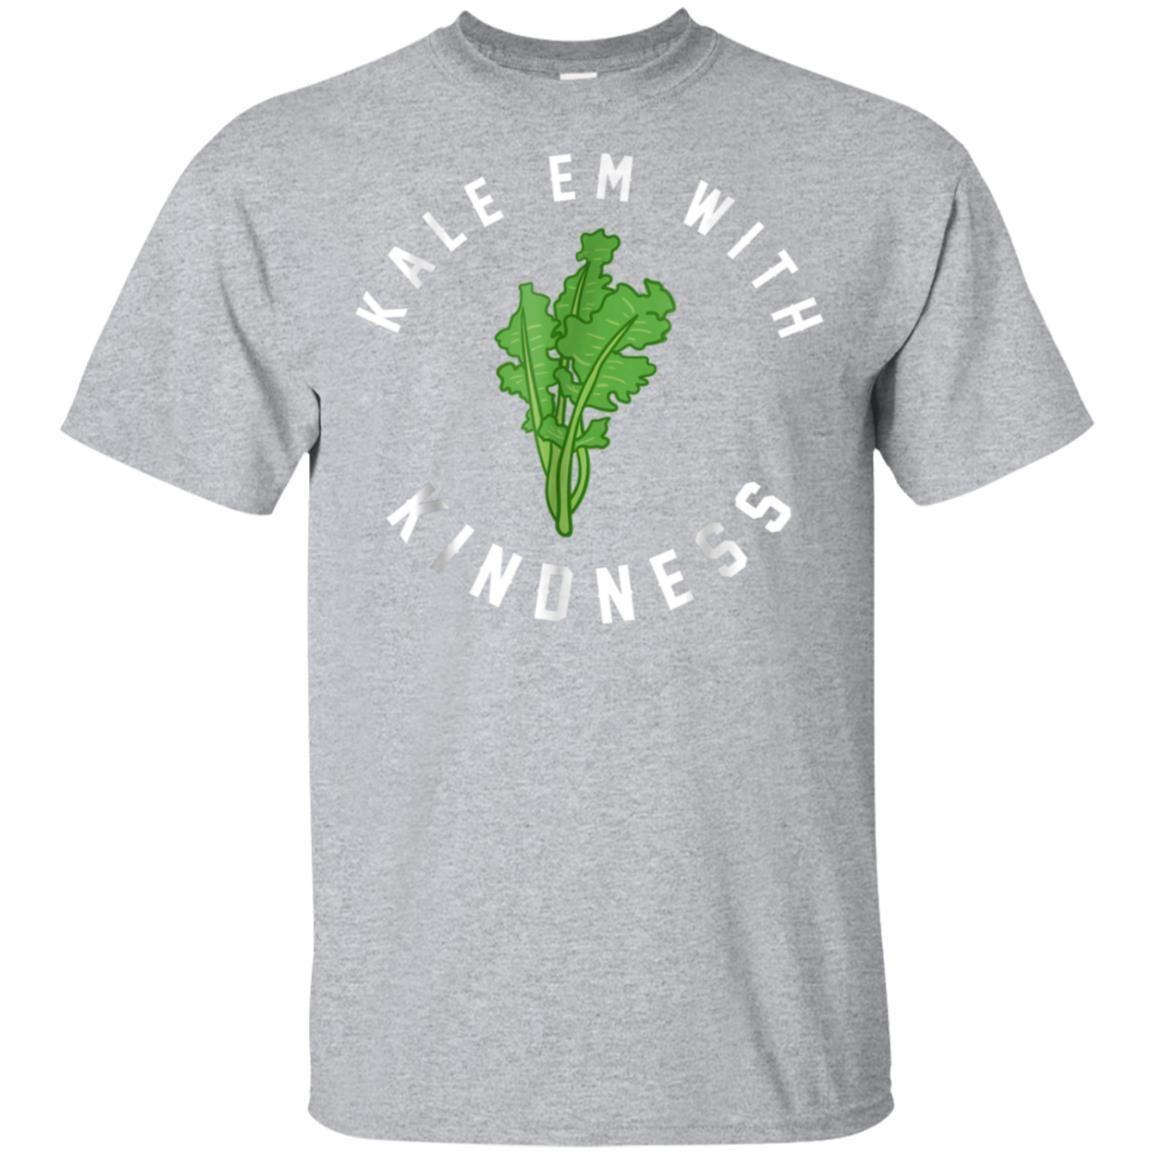 99promocode Kale Em With Kindness Funny Cool Pun Green Veggies T Shirt Green Veggies Kindness Shirts T Shirt